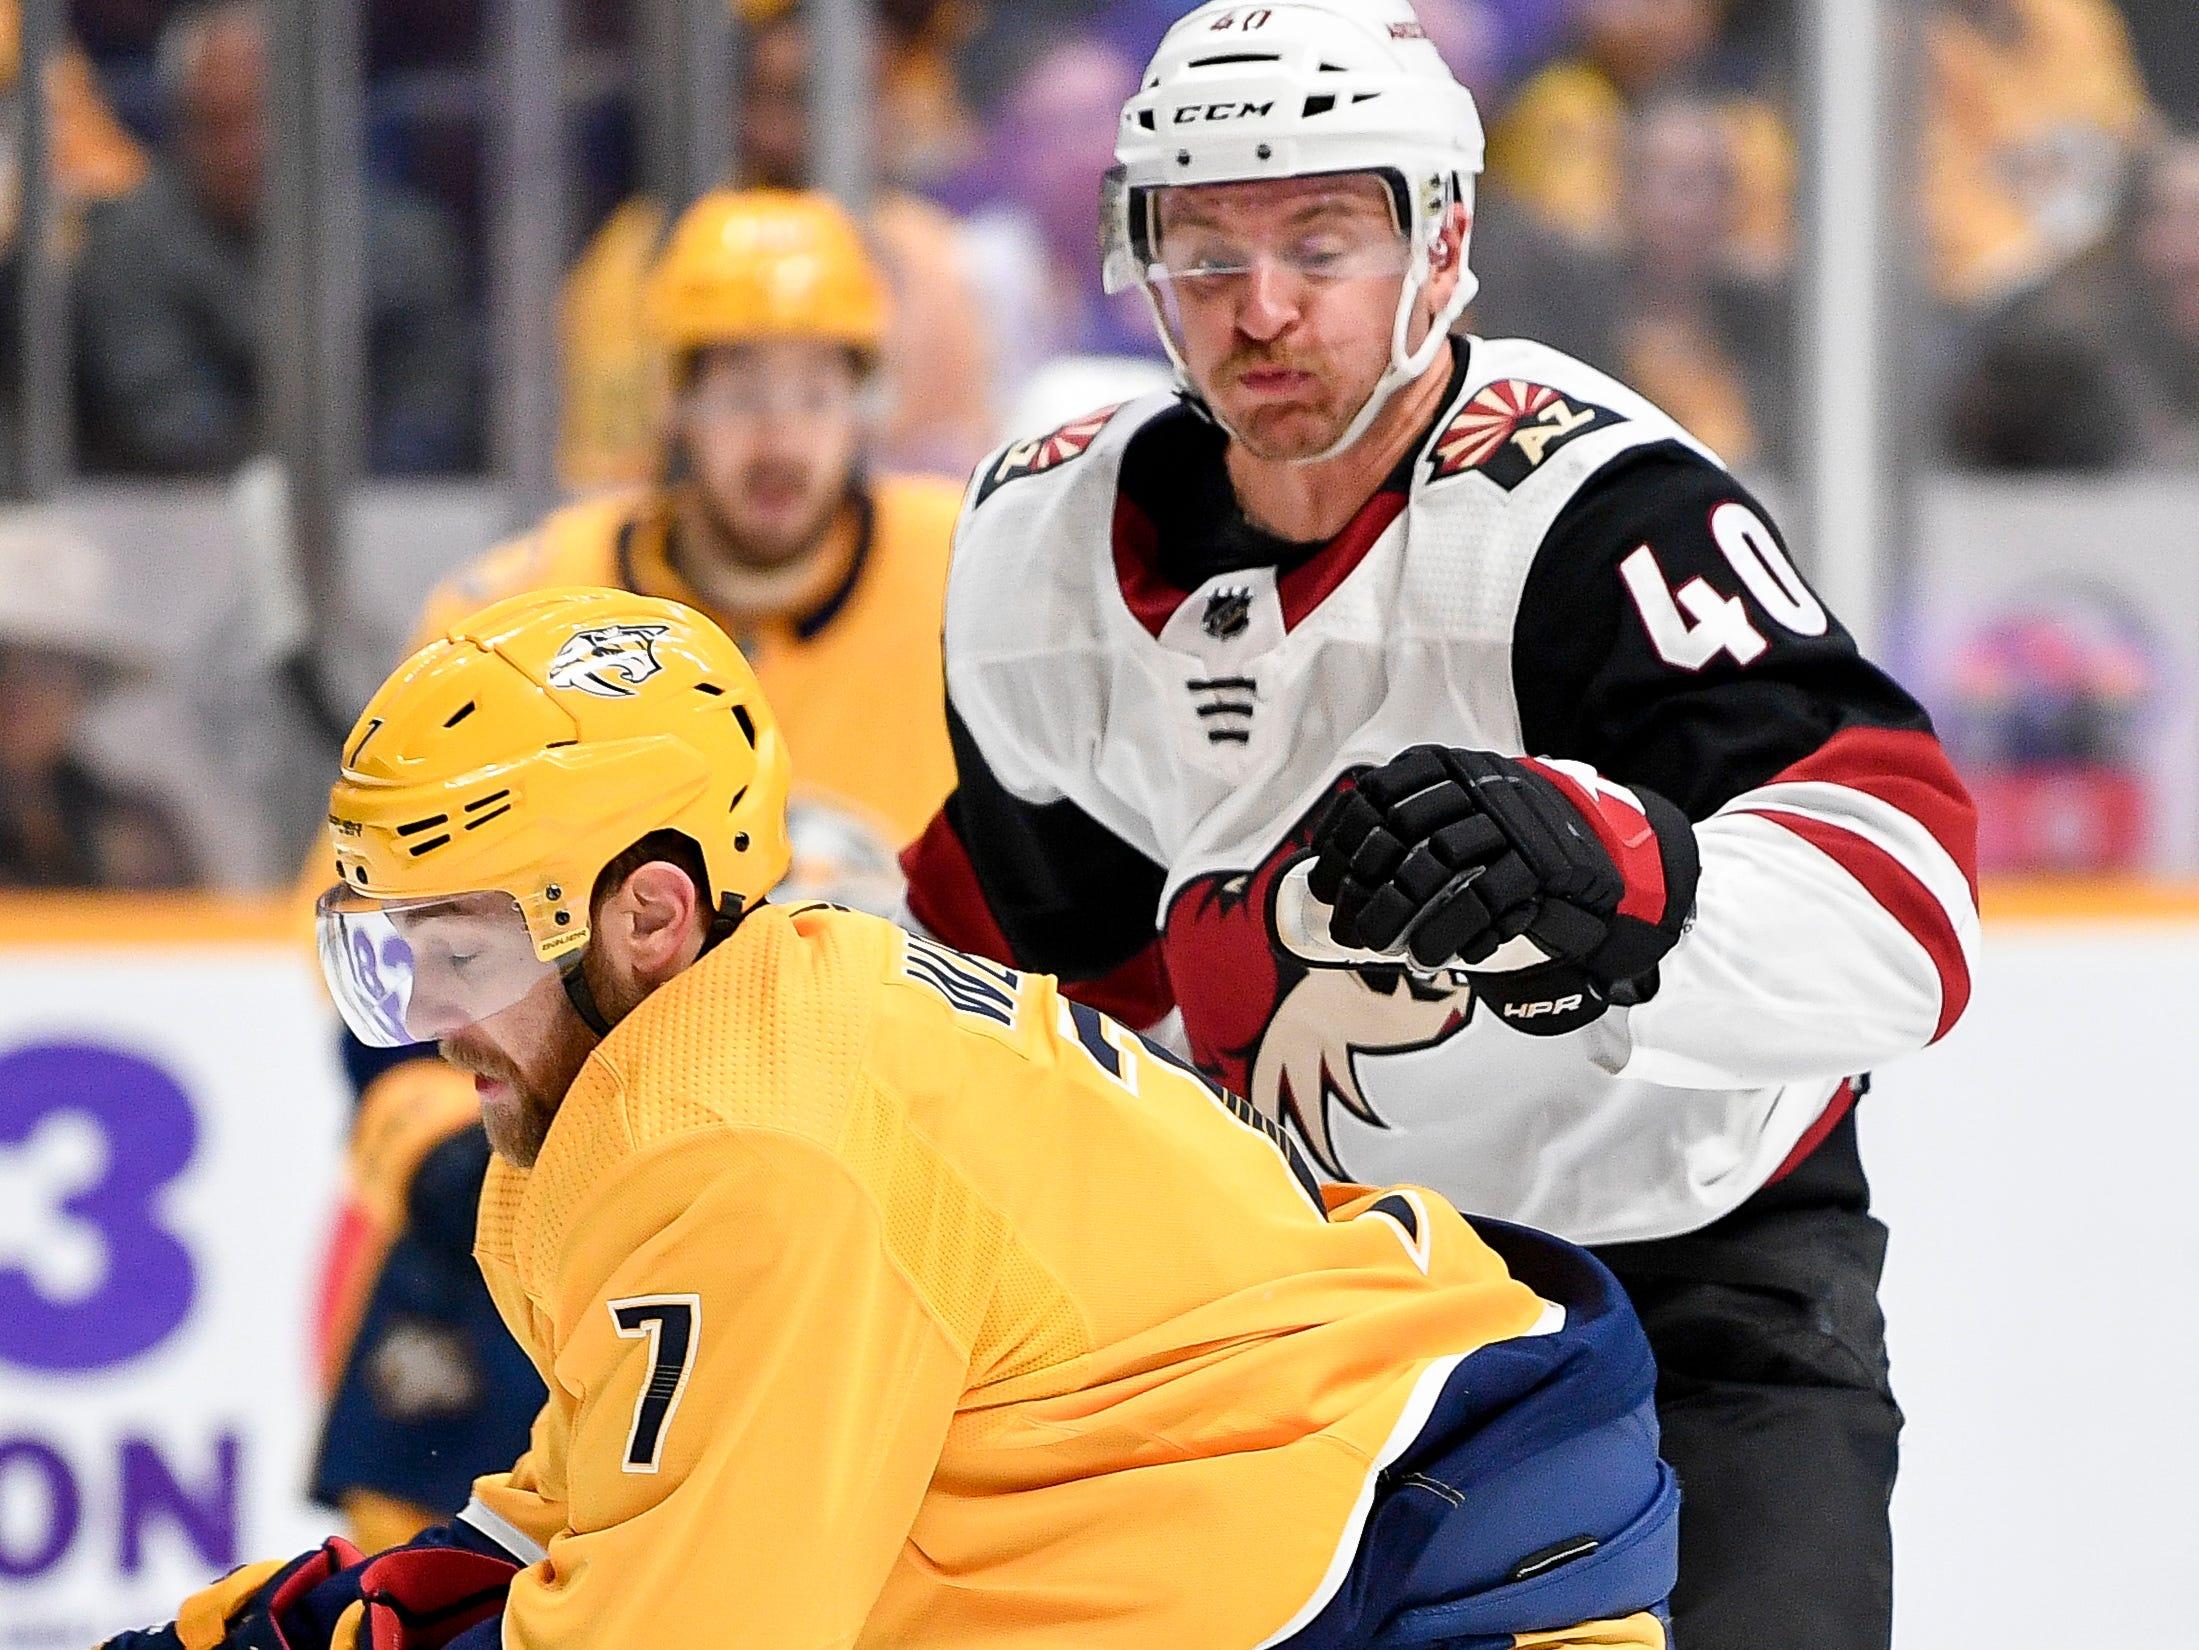 Nashville Predators defenseman Yannick Weber (7) battles Arizona Coyotes right wing Michael Grabner (40) during the second period at Bridgestone Arena in Nashville, Tenn., Thursday, Nov. 29, 2018.